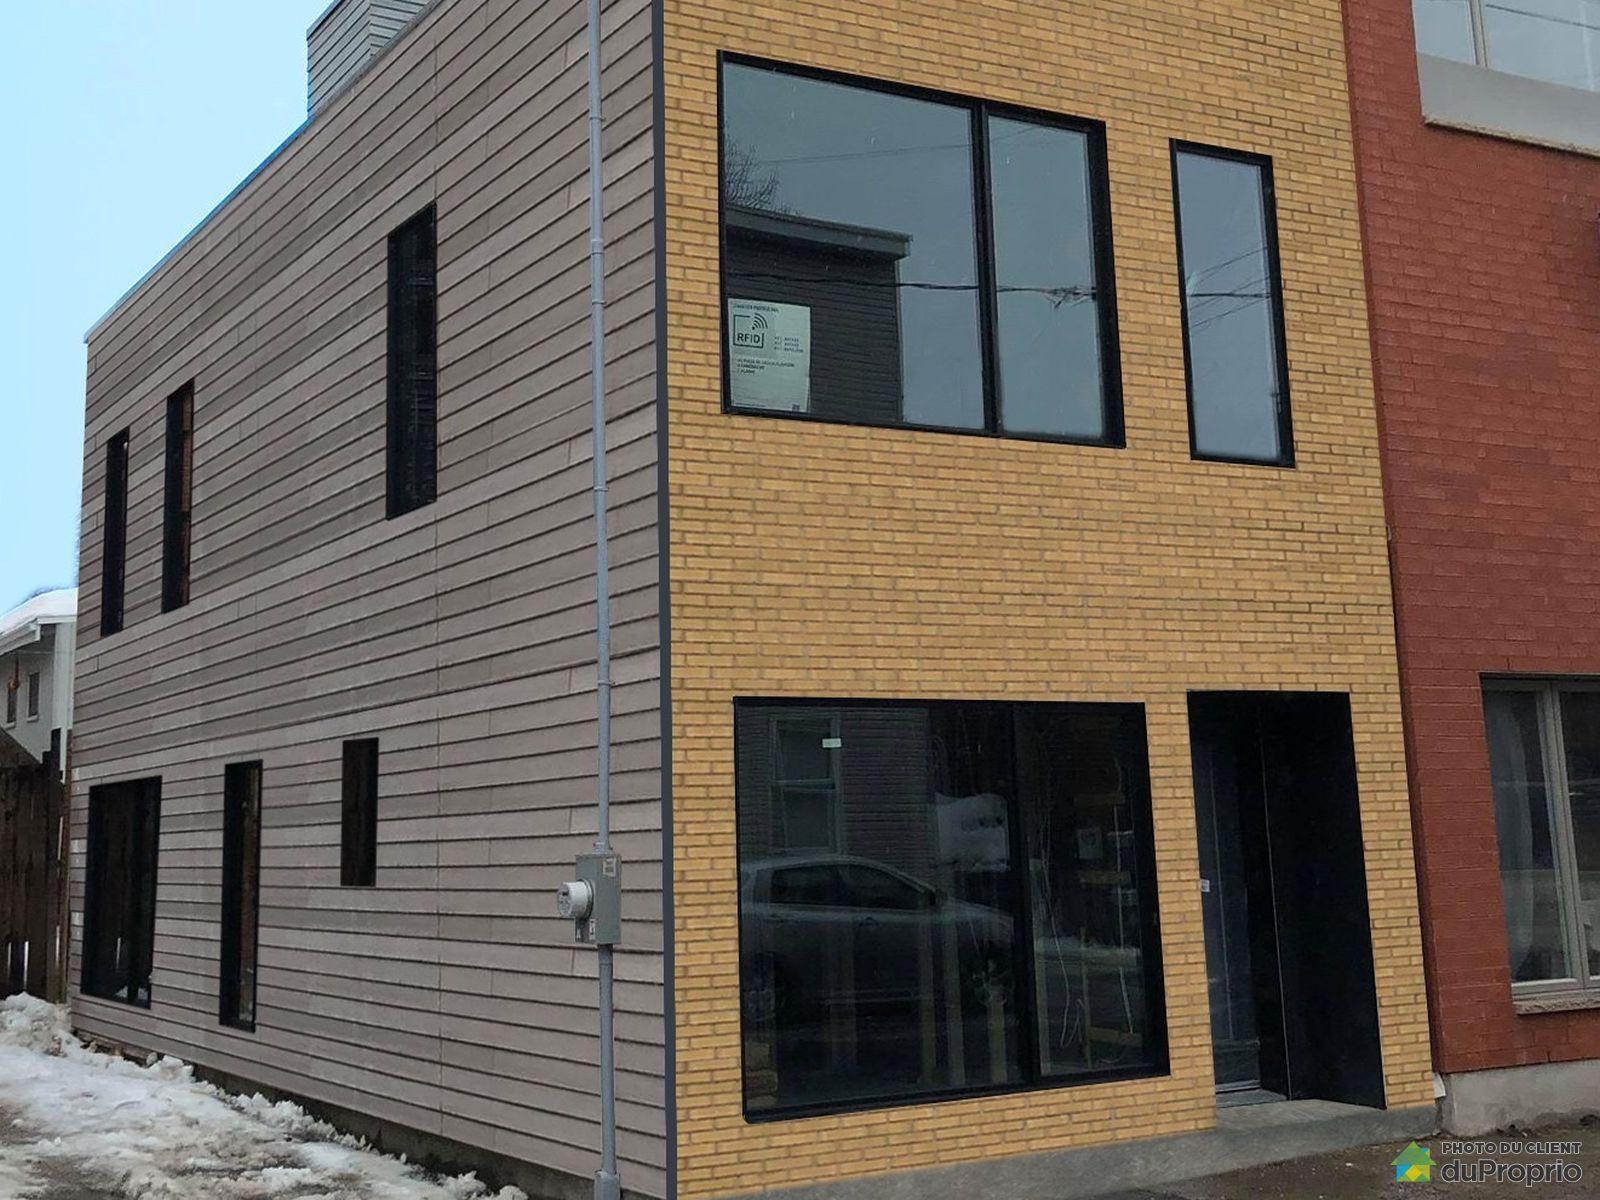 407, rue Bayard - Par Construction EFL, Saint-Sauveur à vendre